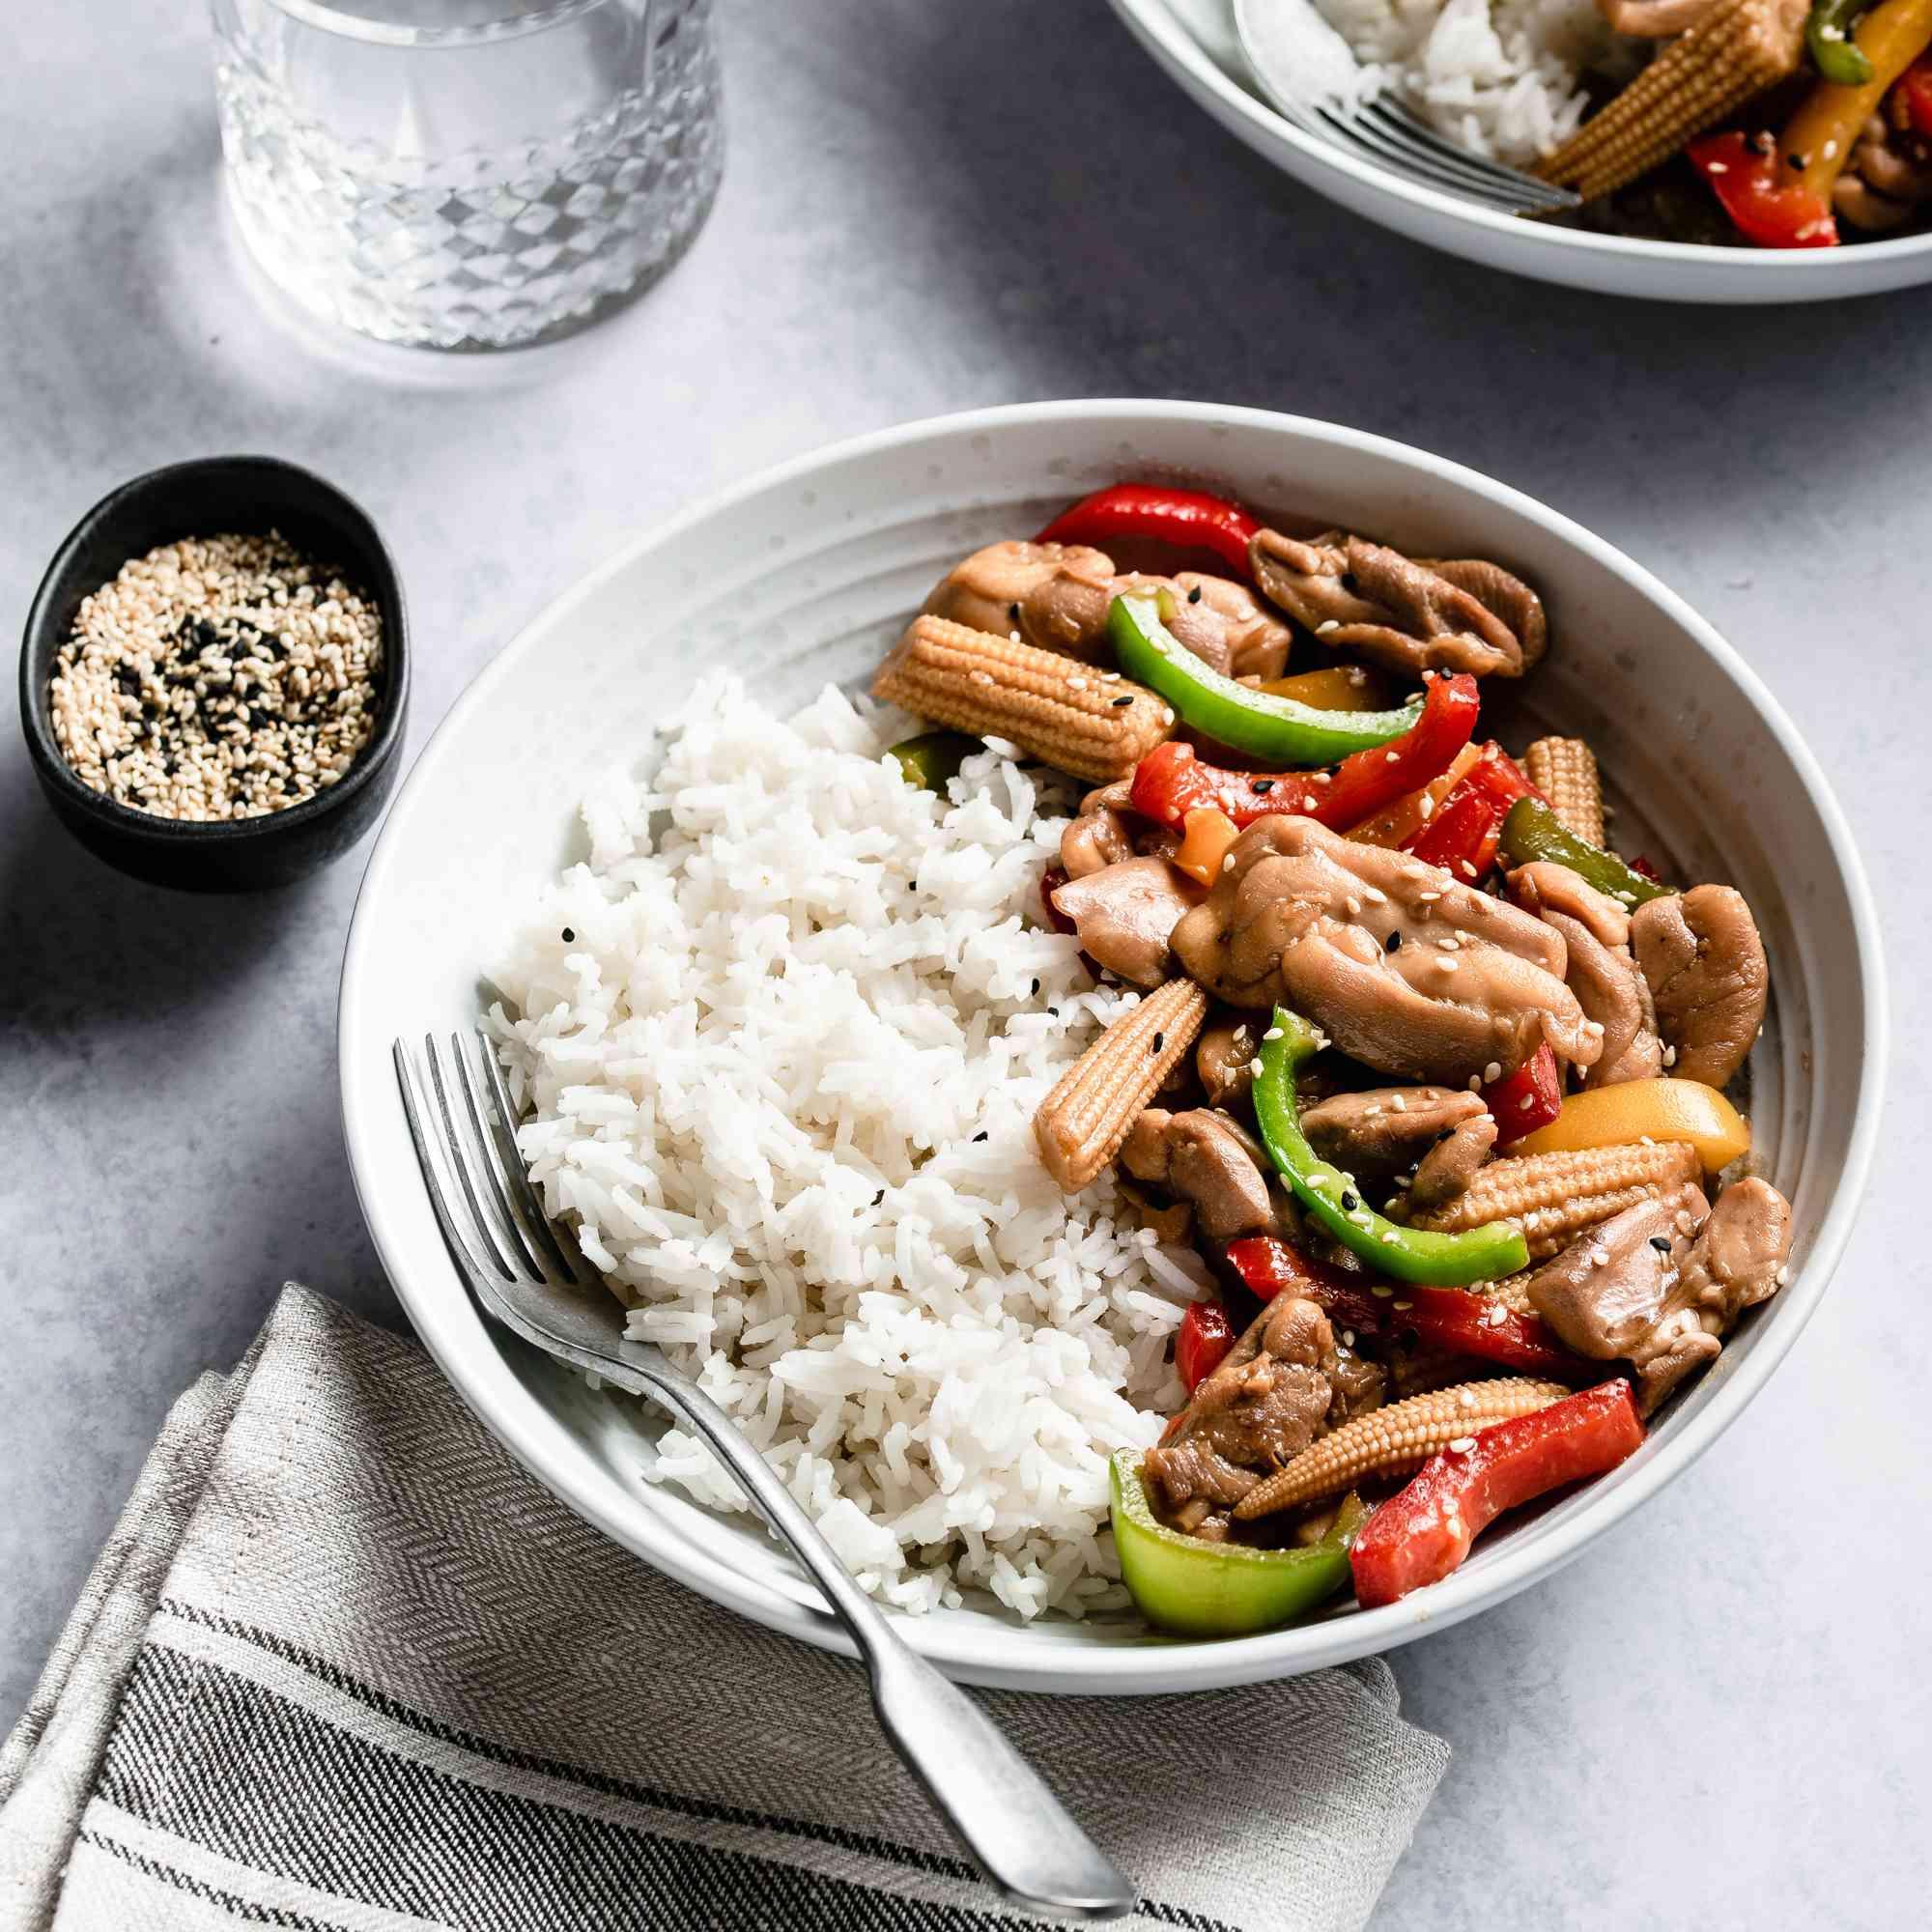 Chicken stir fry with bell pepper